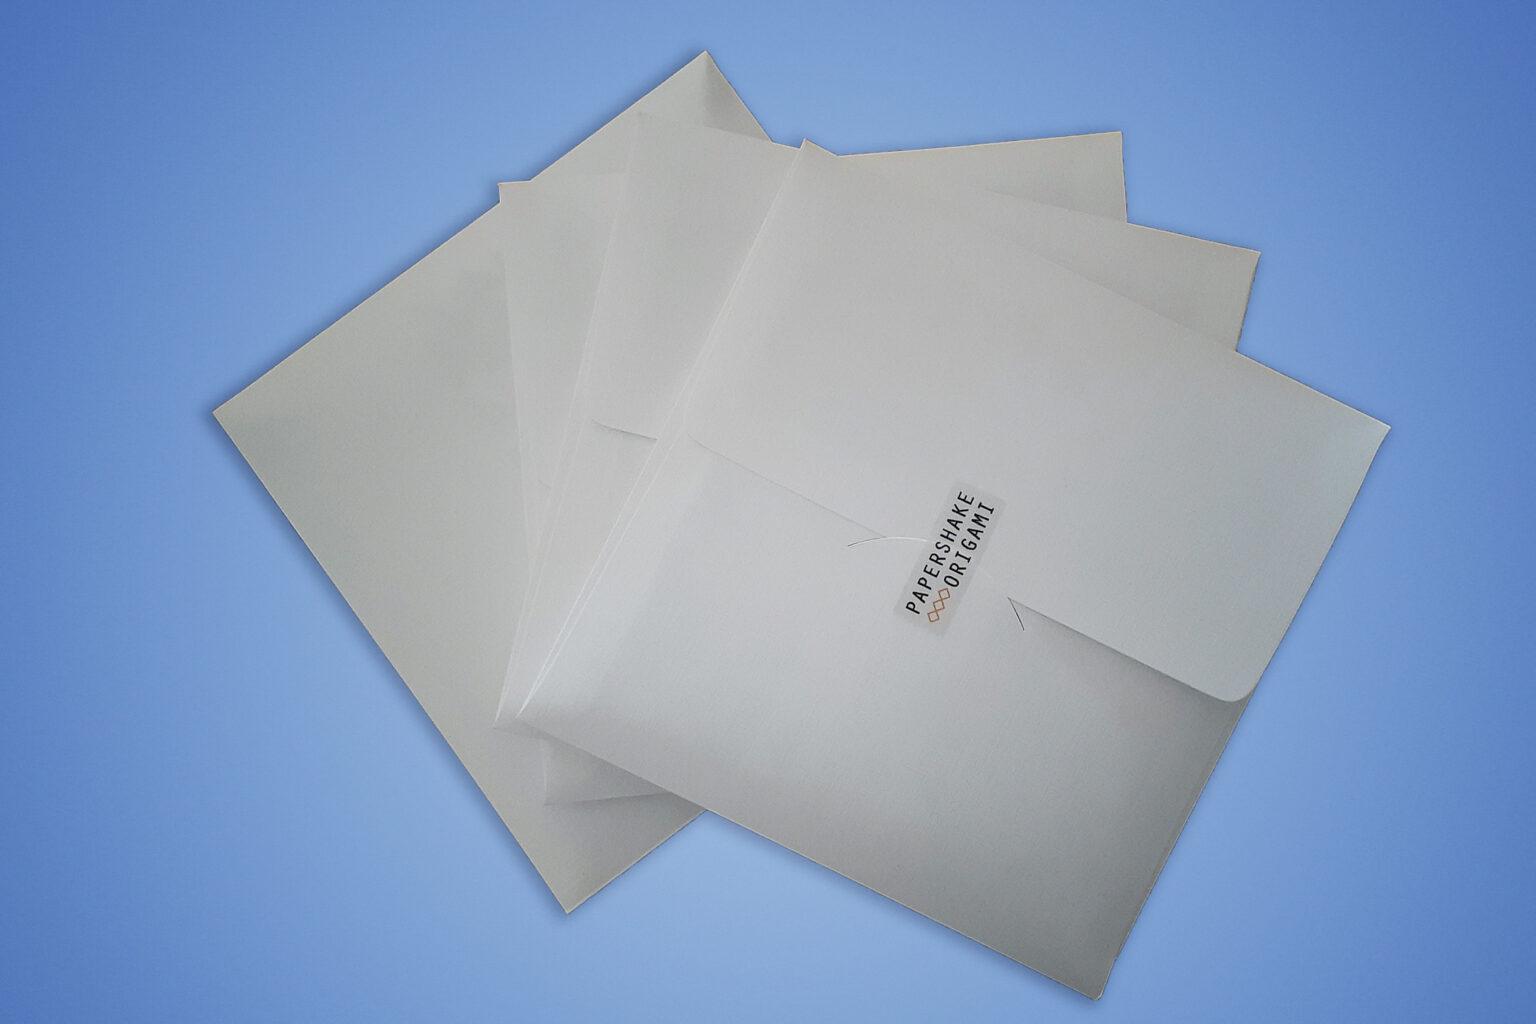 201 Origami Packs (1)s